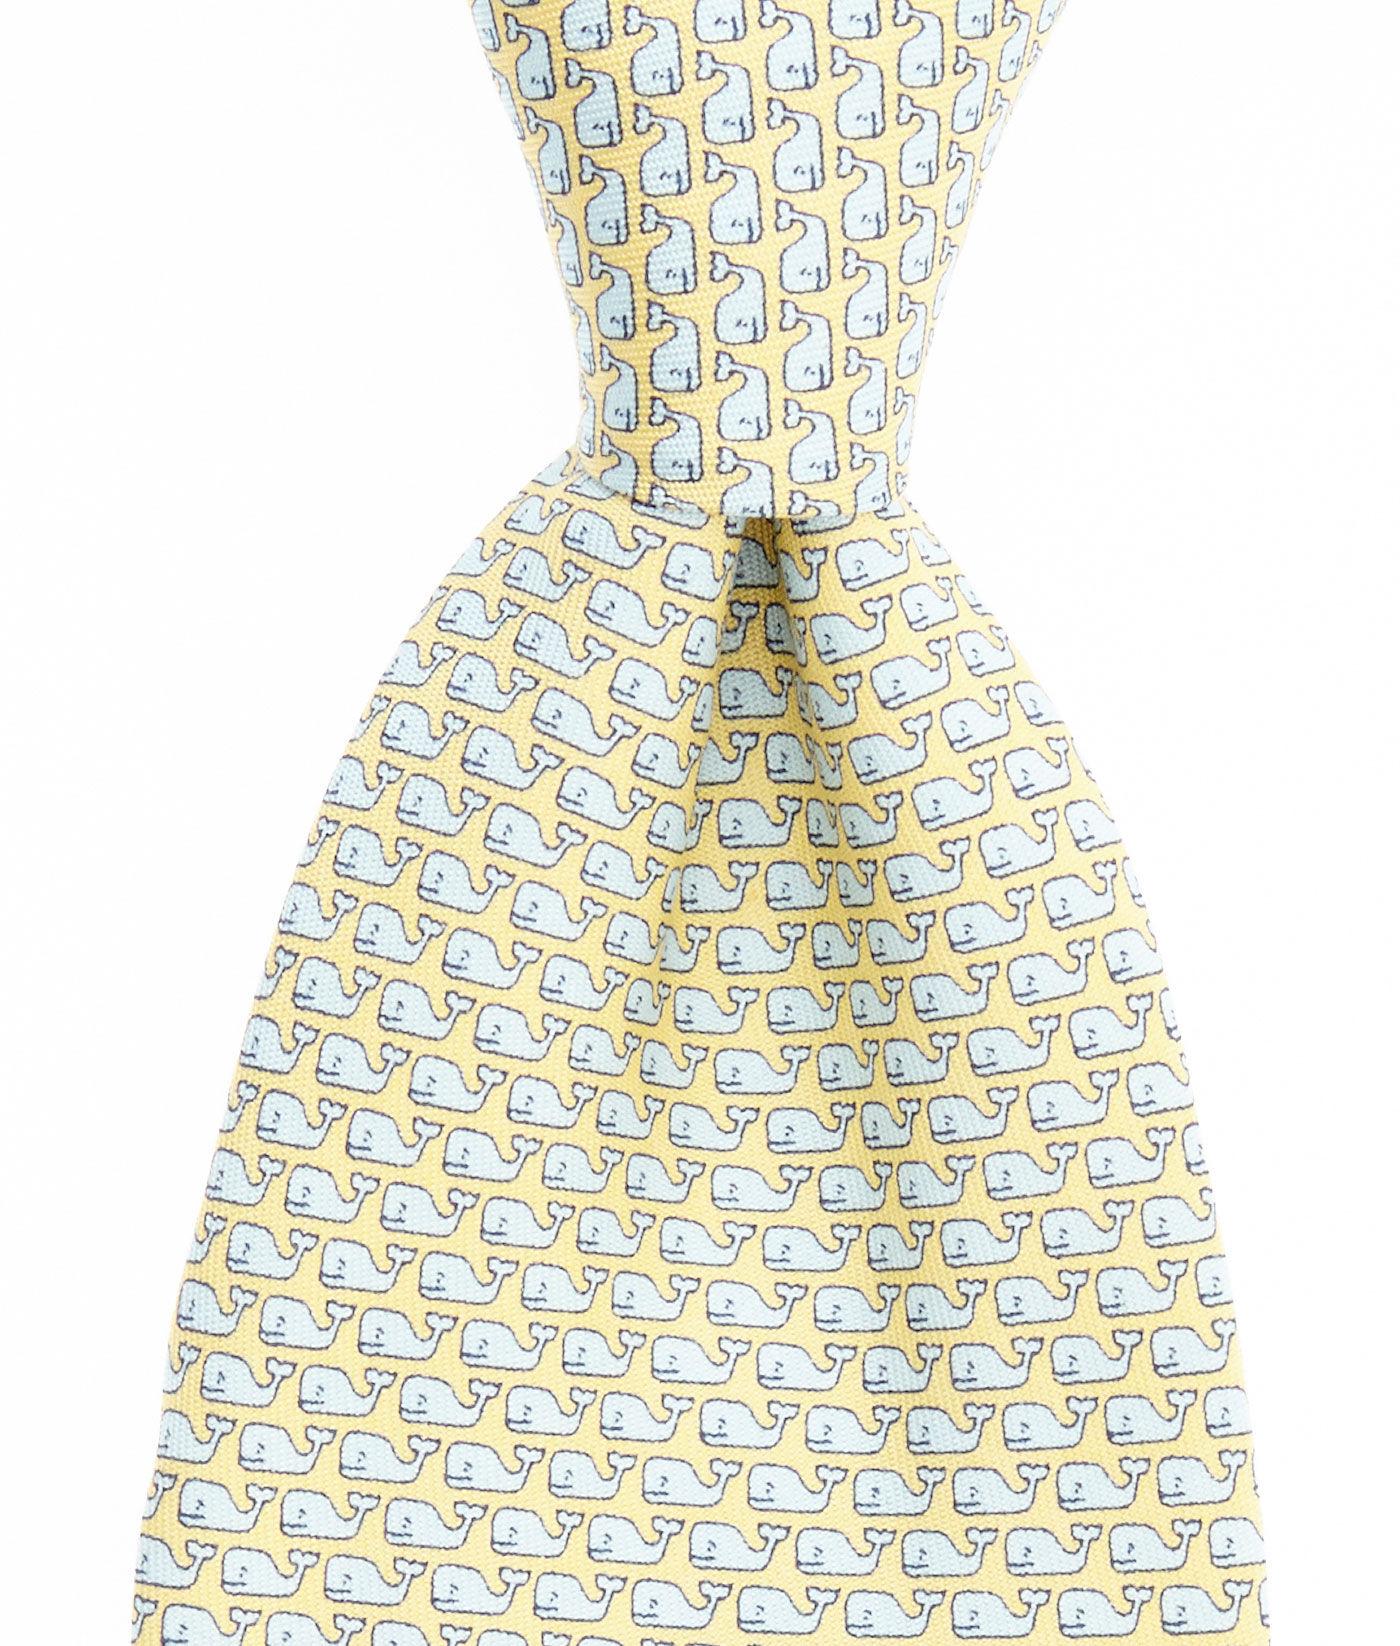 Vineyard Vines Men/'s Polka Dot Goe Silk Tie in Navy with Gift Box $85.00